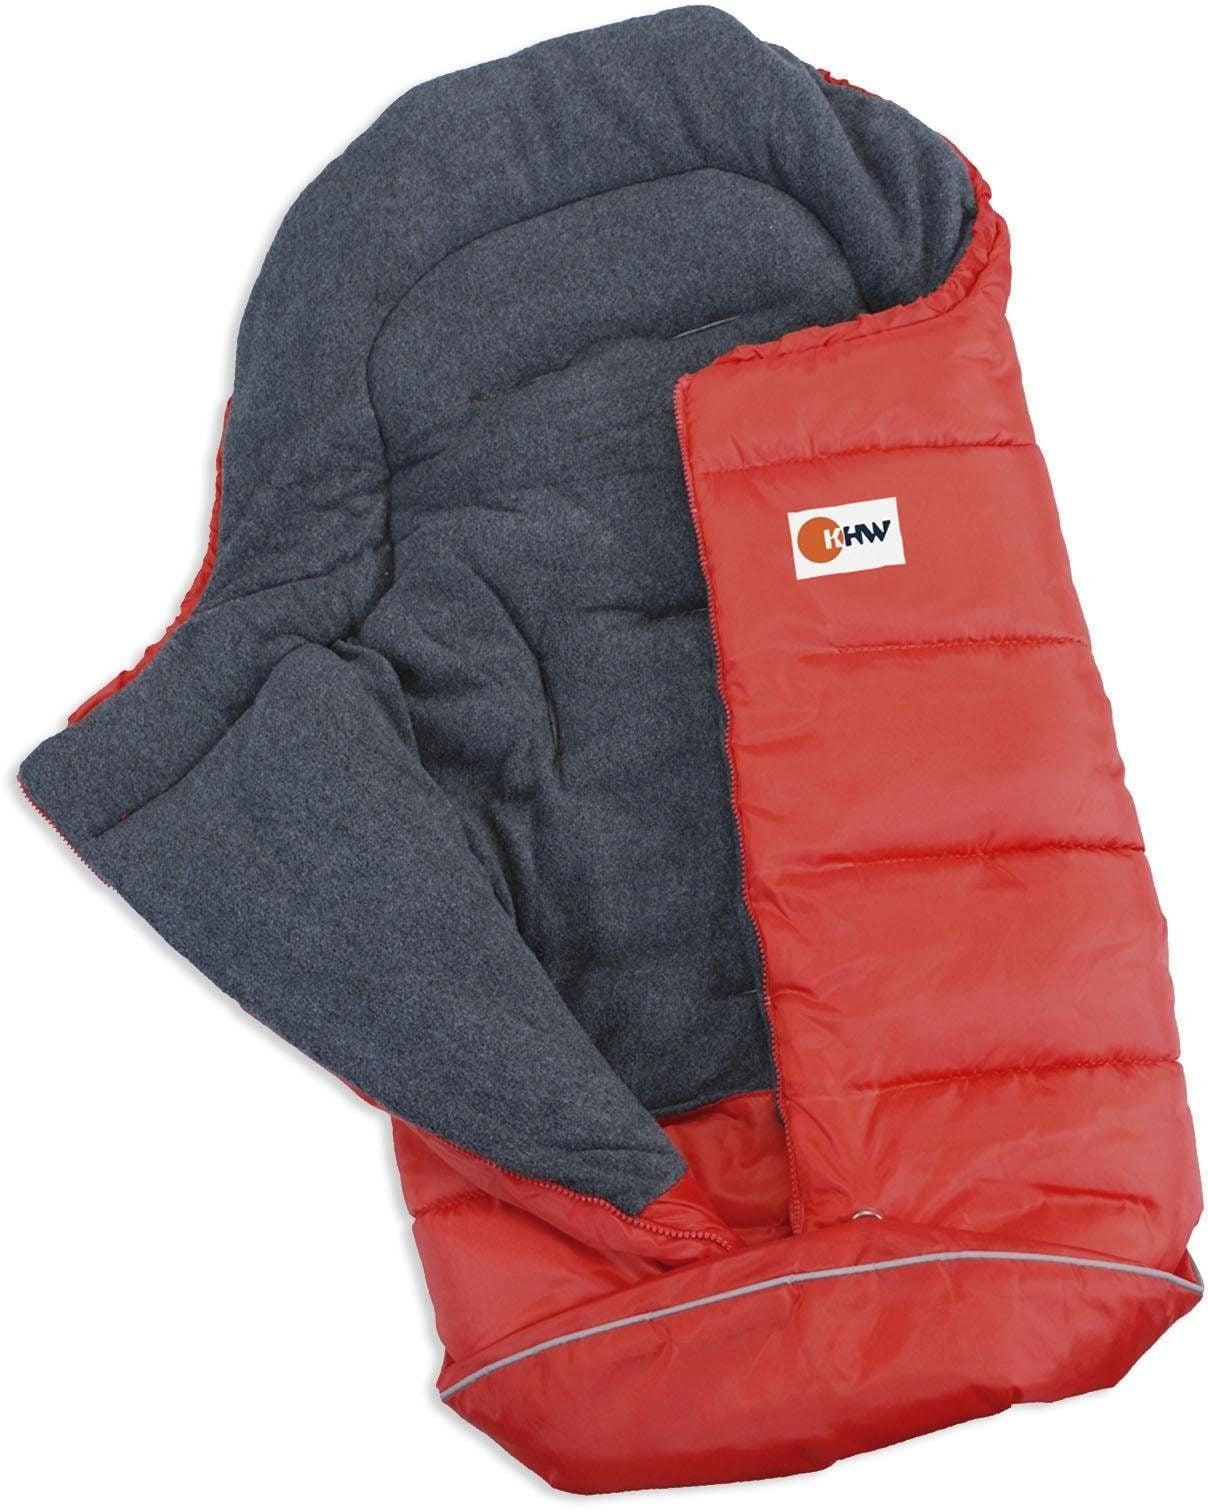 KHW Schlittensack Husky rot Kinder Schlafsäcke Camping Schlafen Outdoor Schlafsack